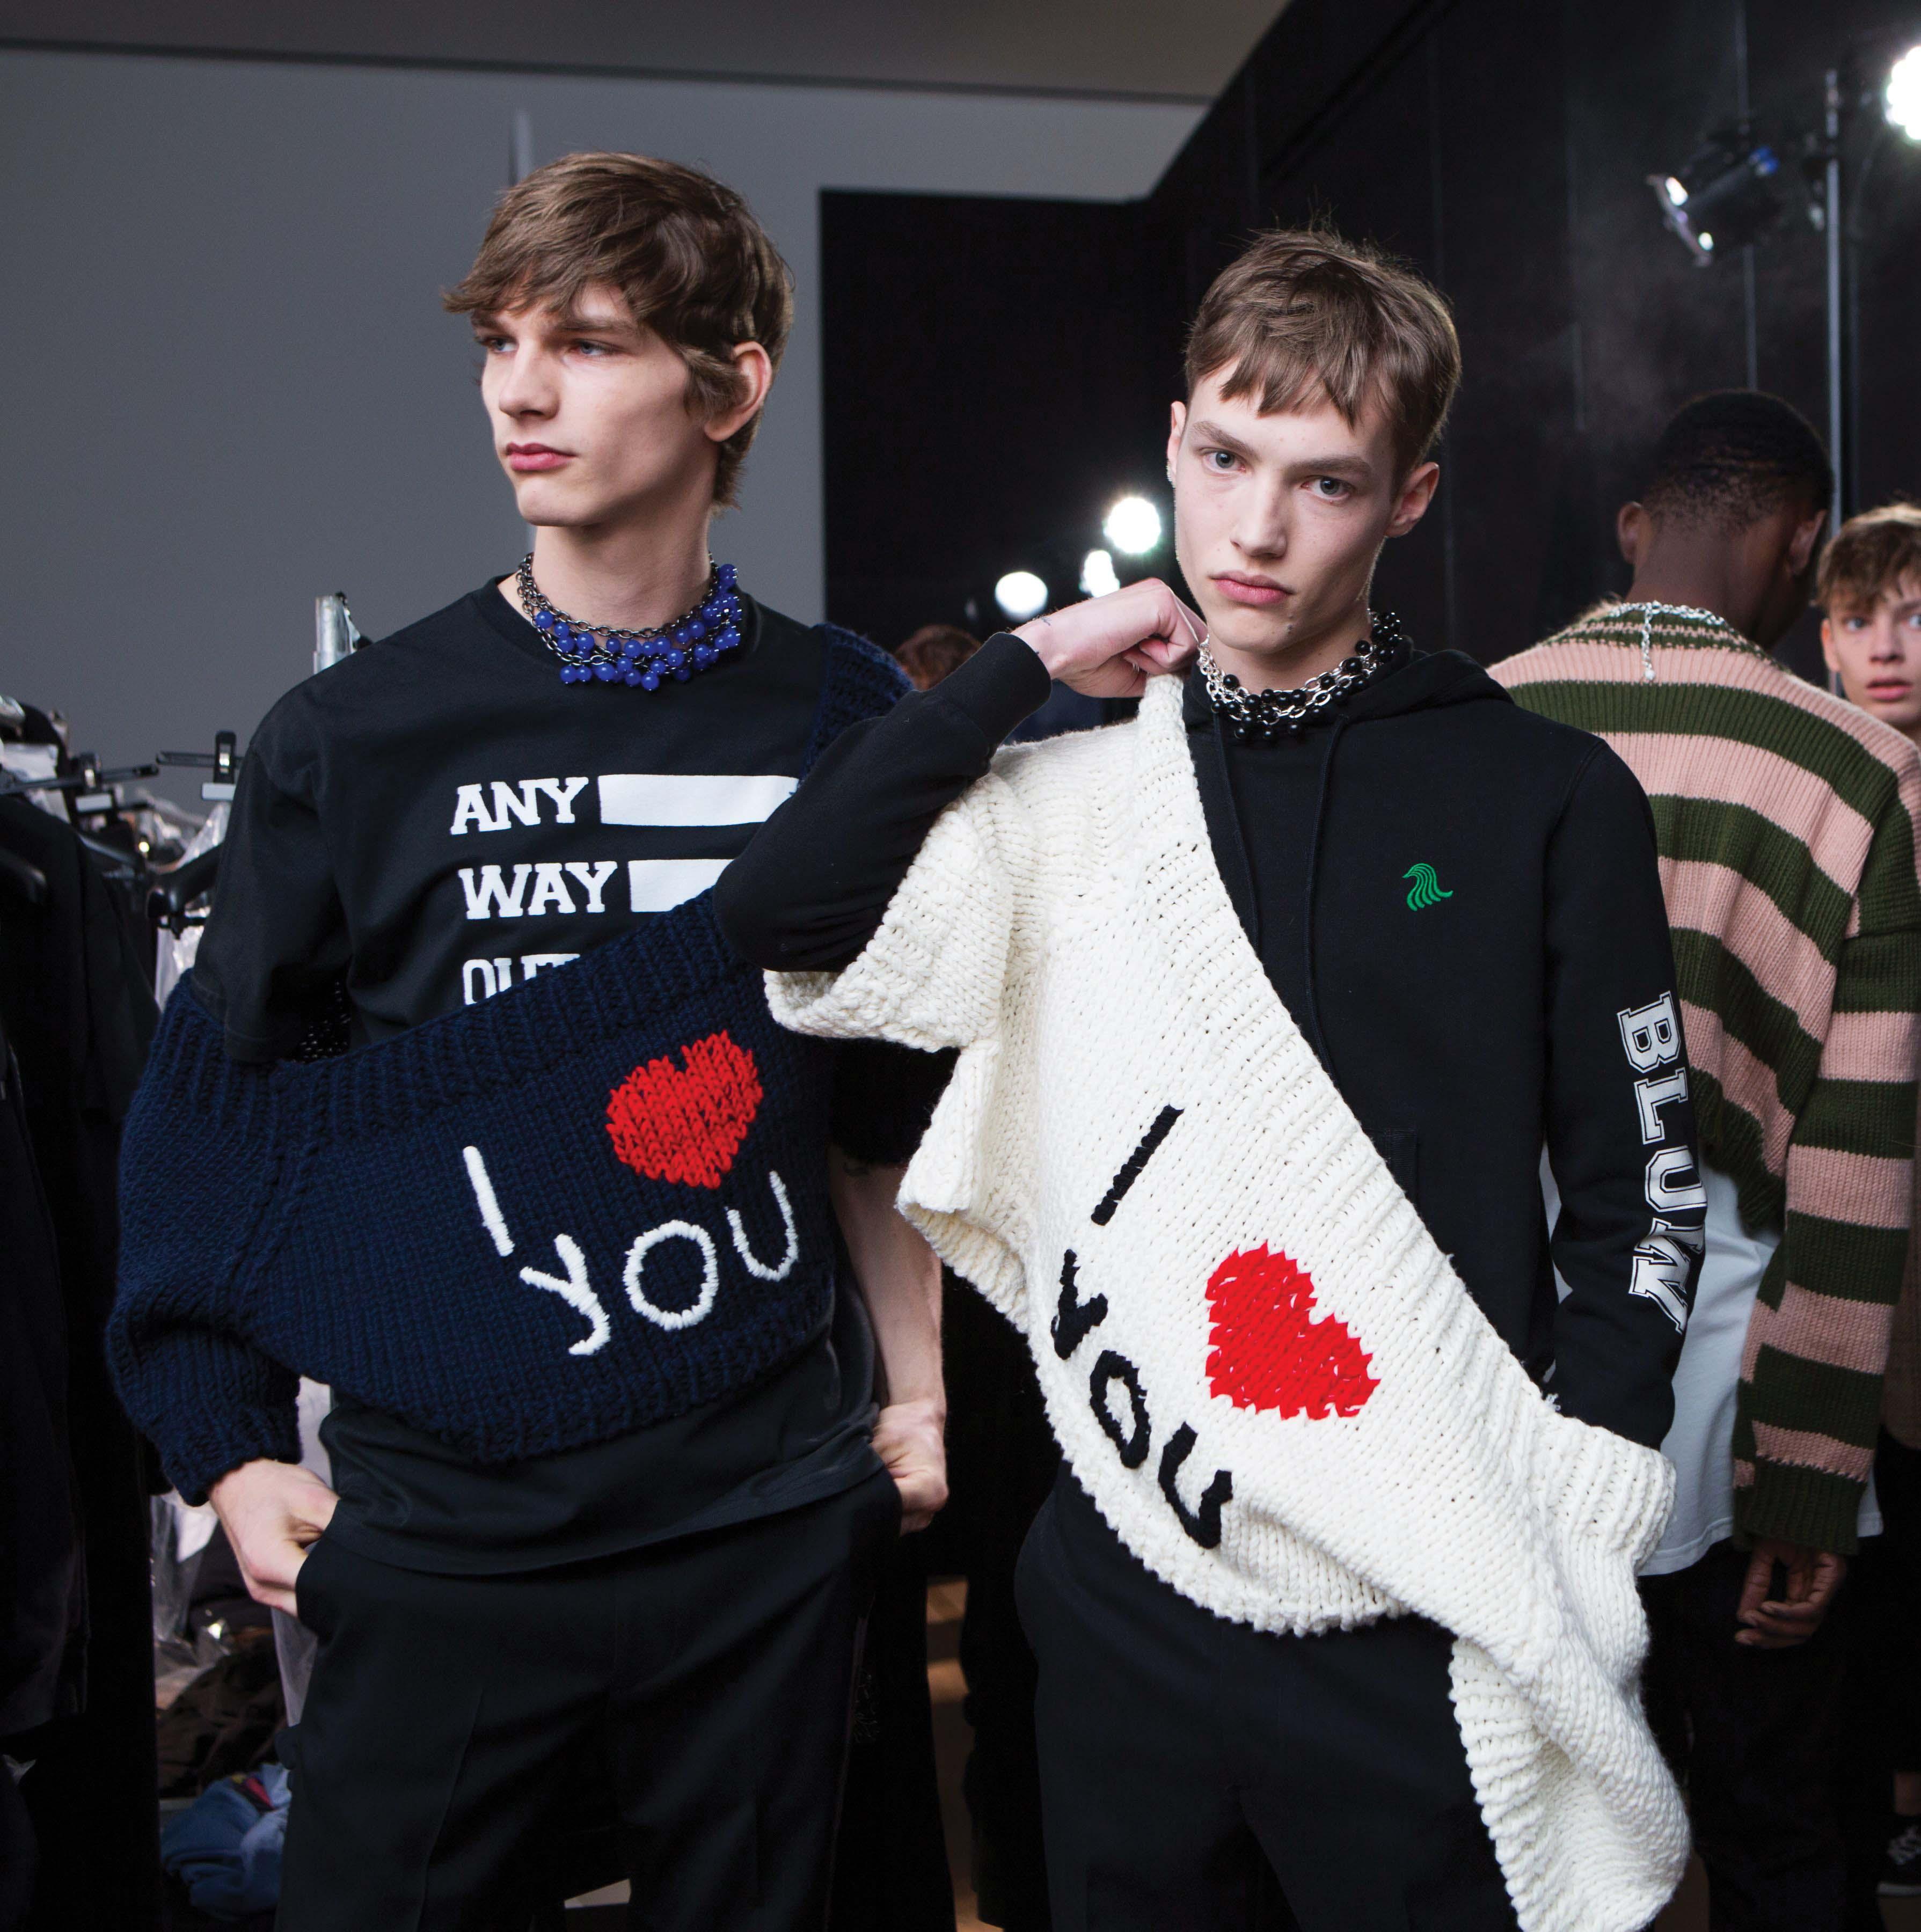 Raf Simons show, Fall Winter 2017, New York Fashion Week Men's, USA - 01 Feb 2017